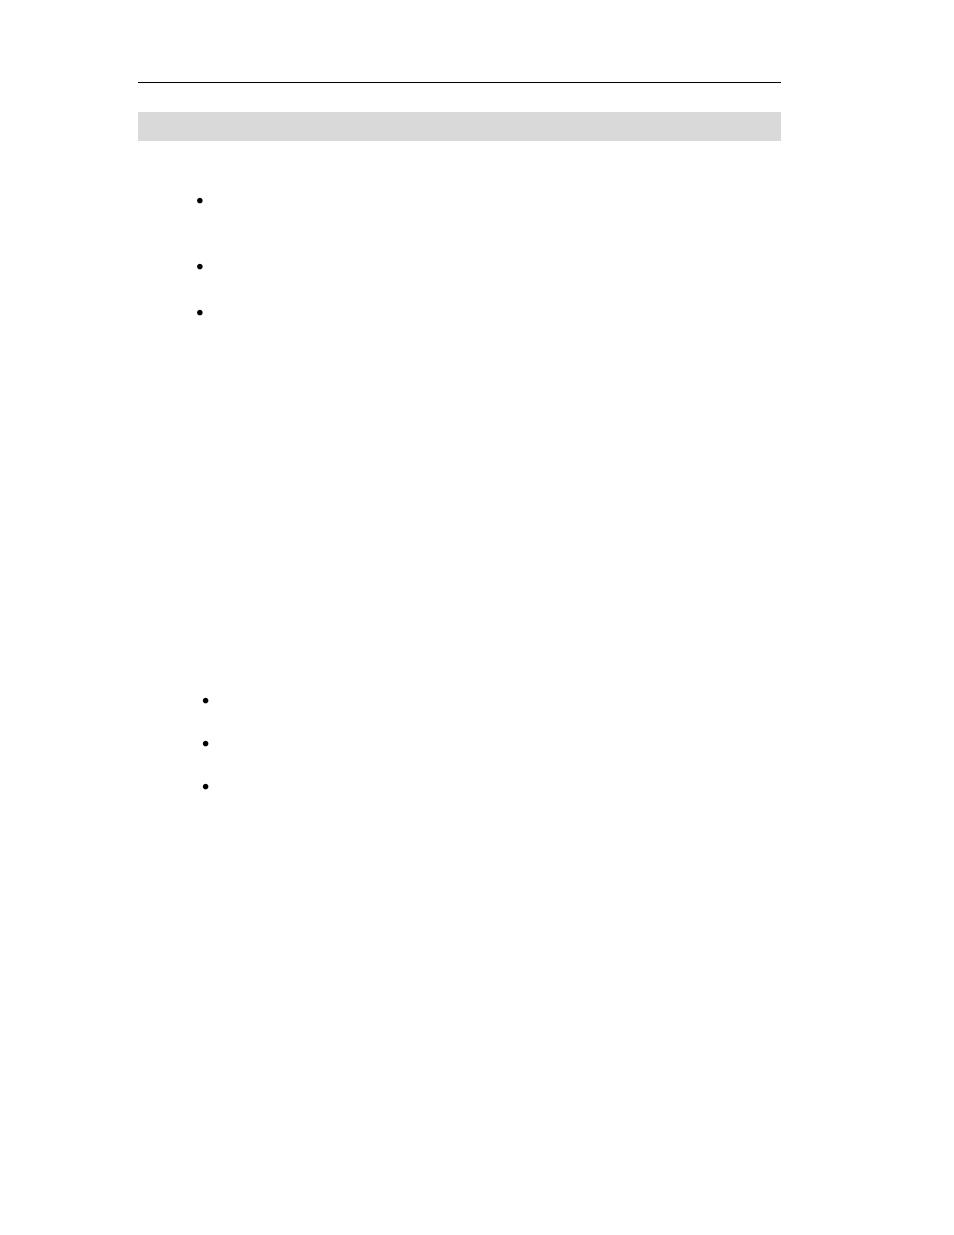 Shared lines and keys, Programming shared line keys | Mitel